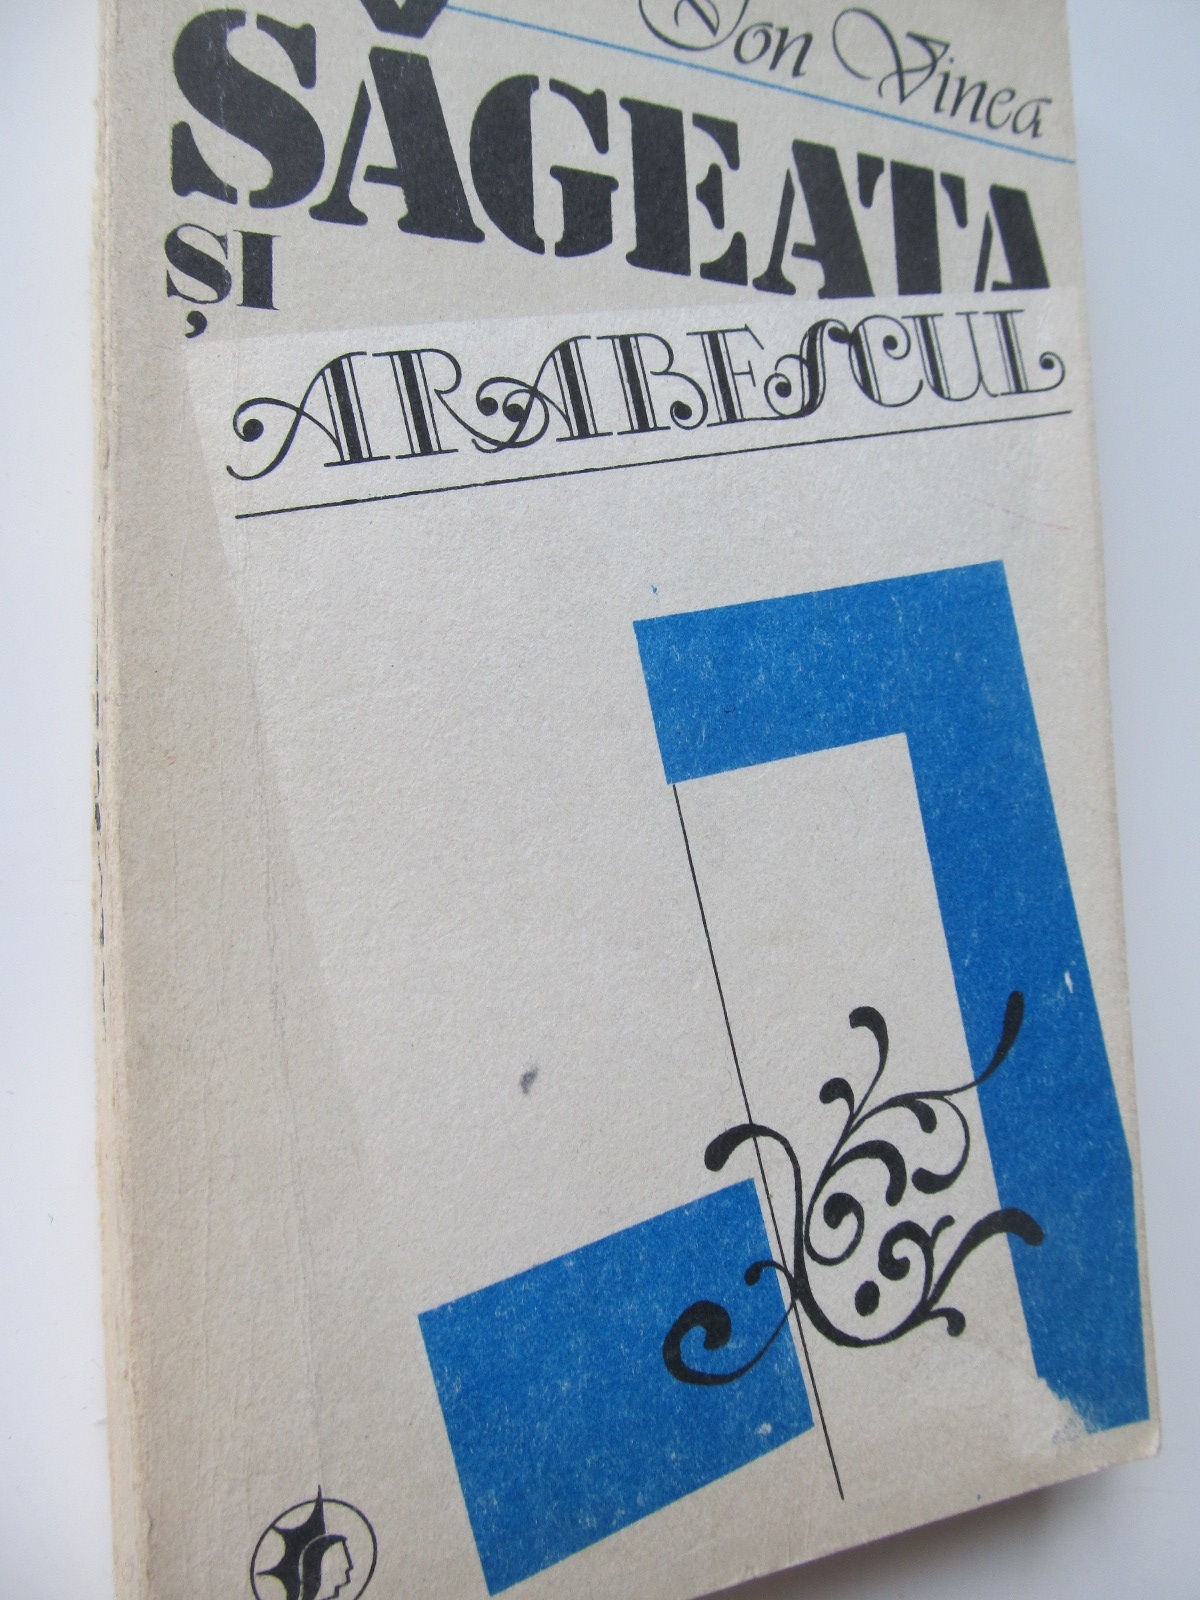 Sageata si arabescul - Ion Vinea | Detalii carte